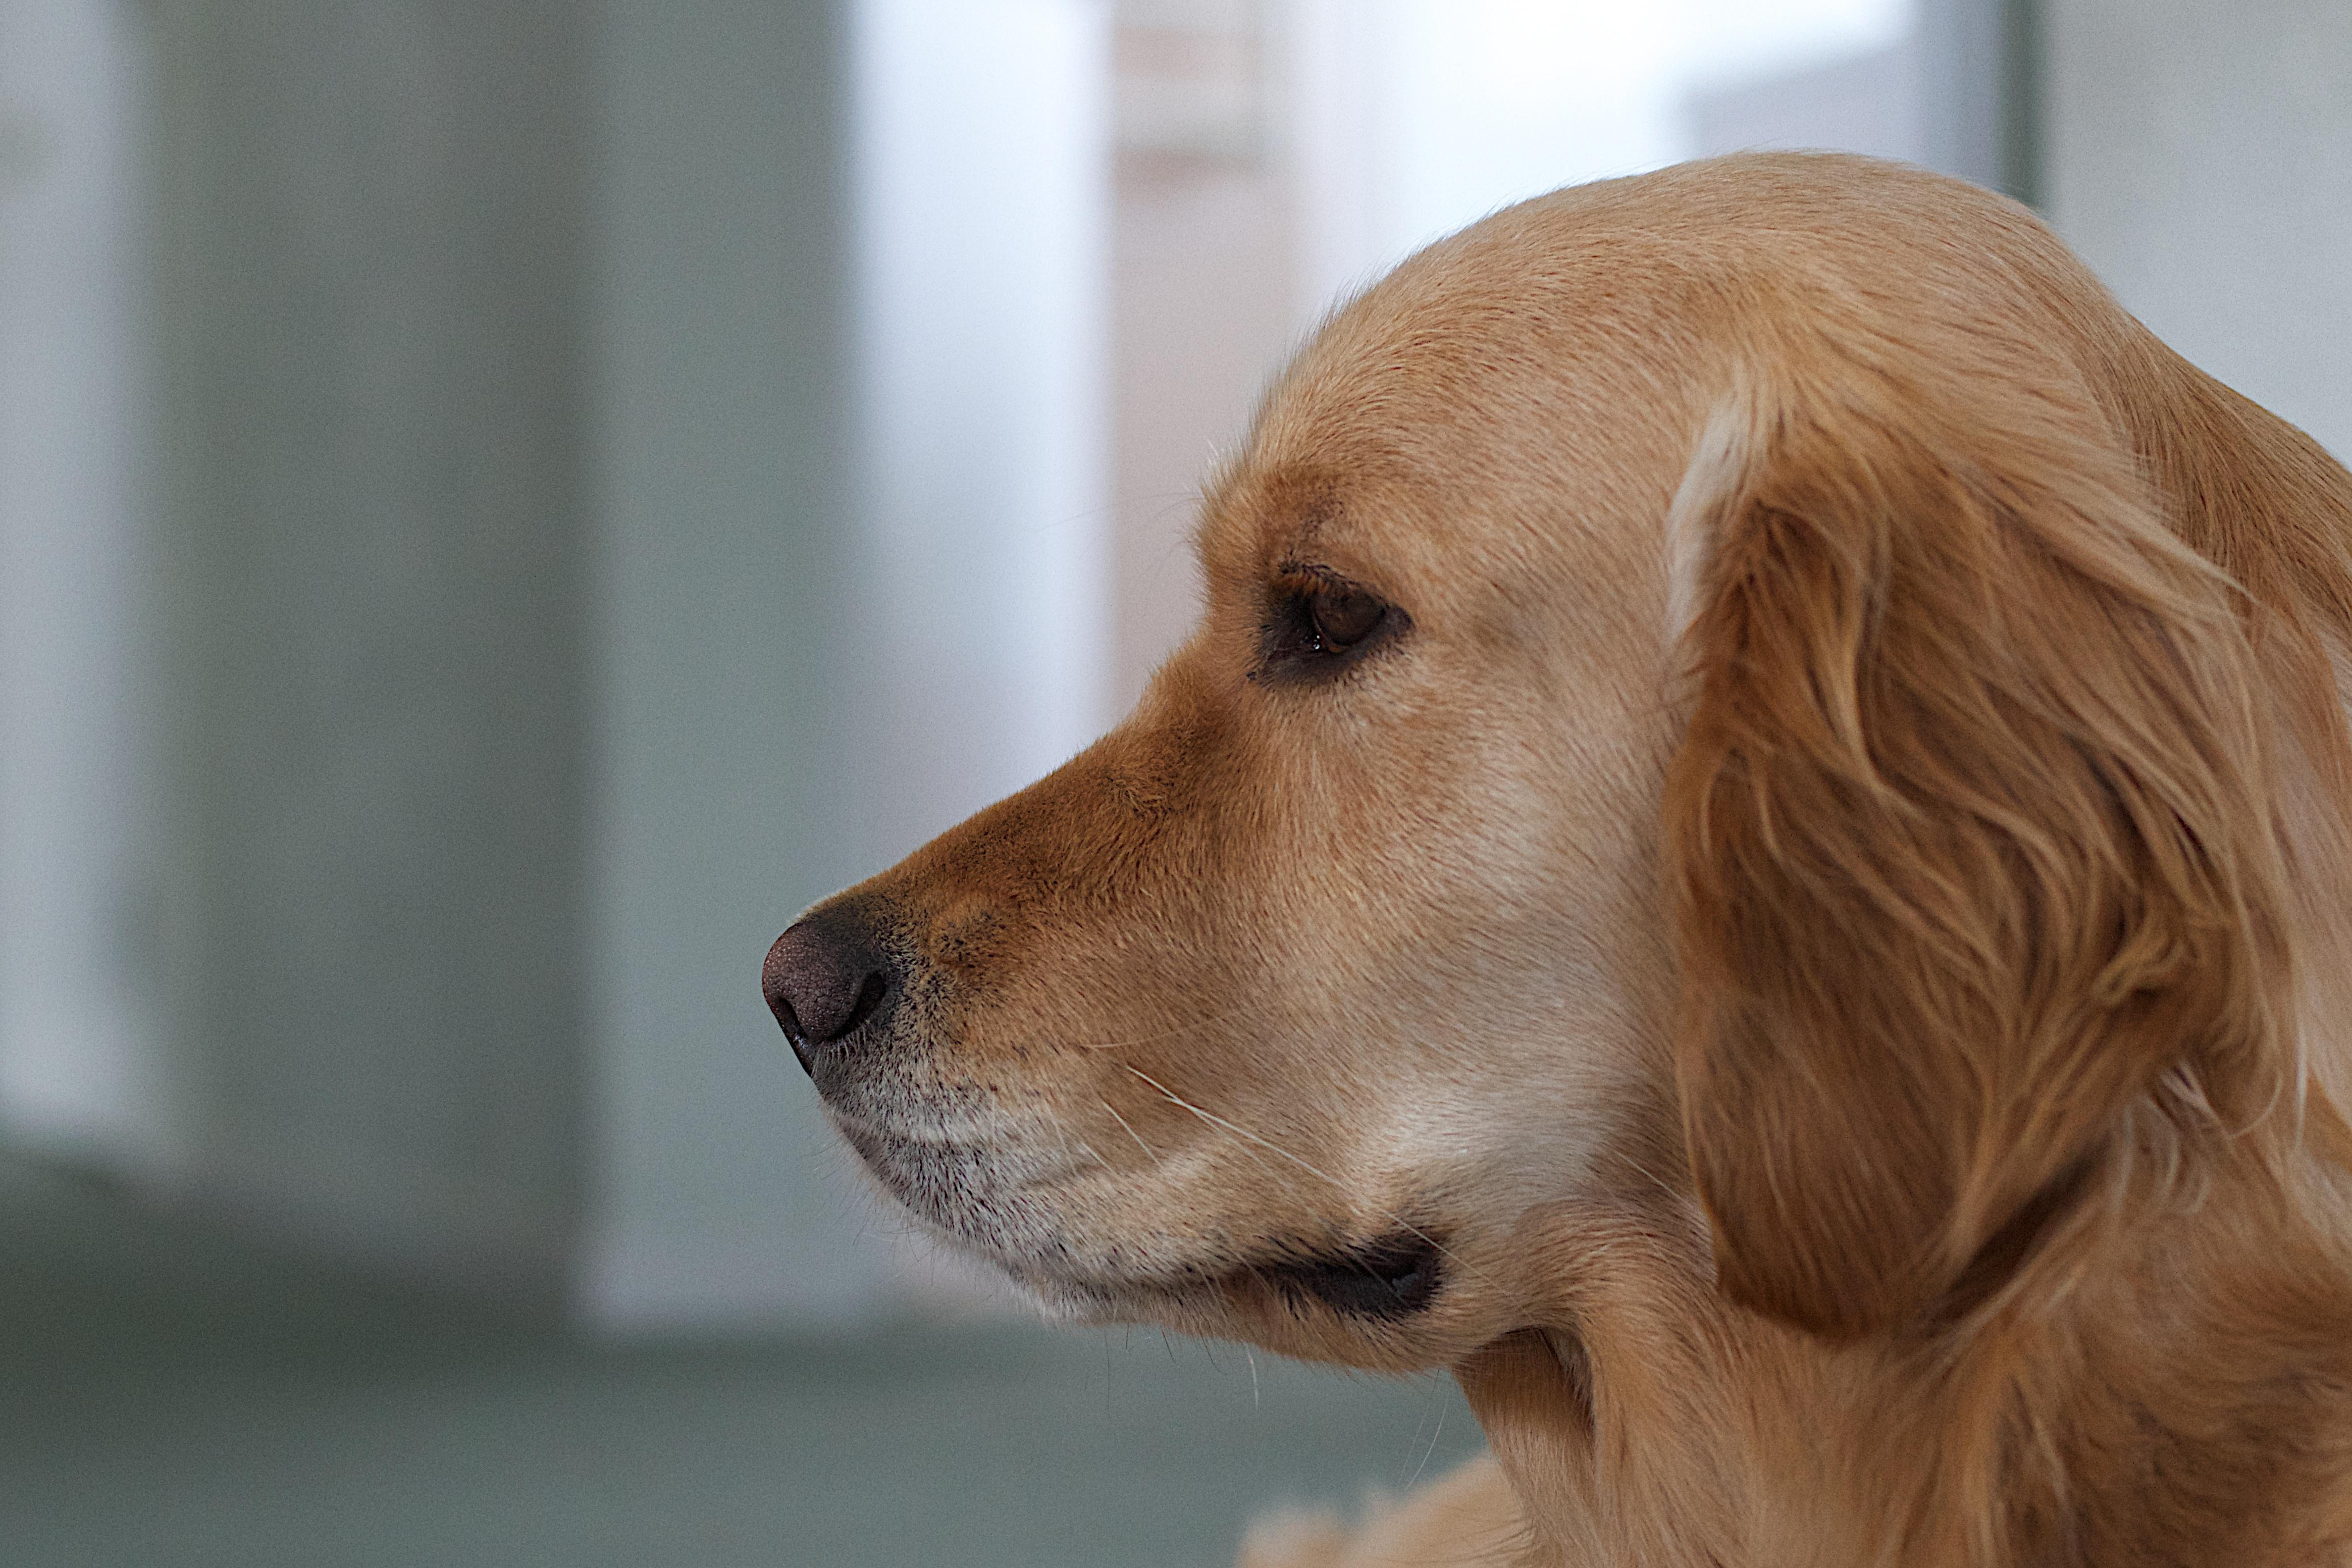 Free Images Puppy Close Up Nose Golden Retriever Vertebrate